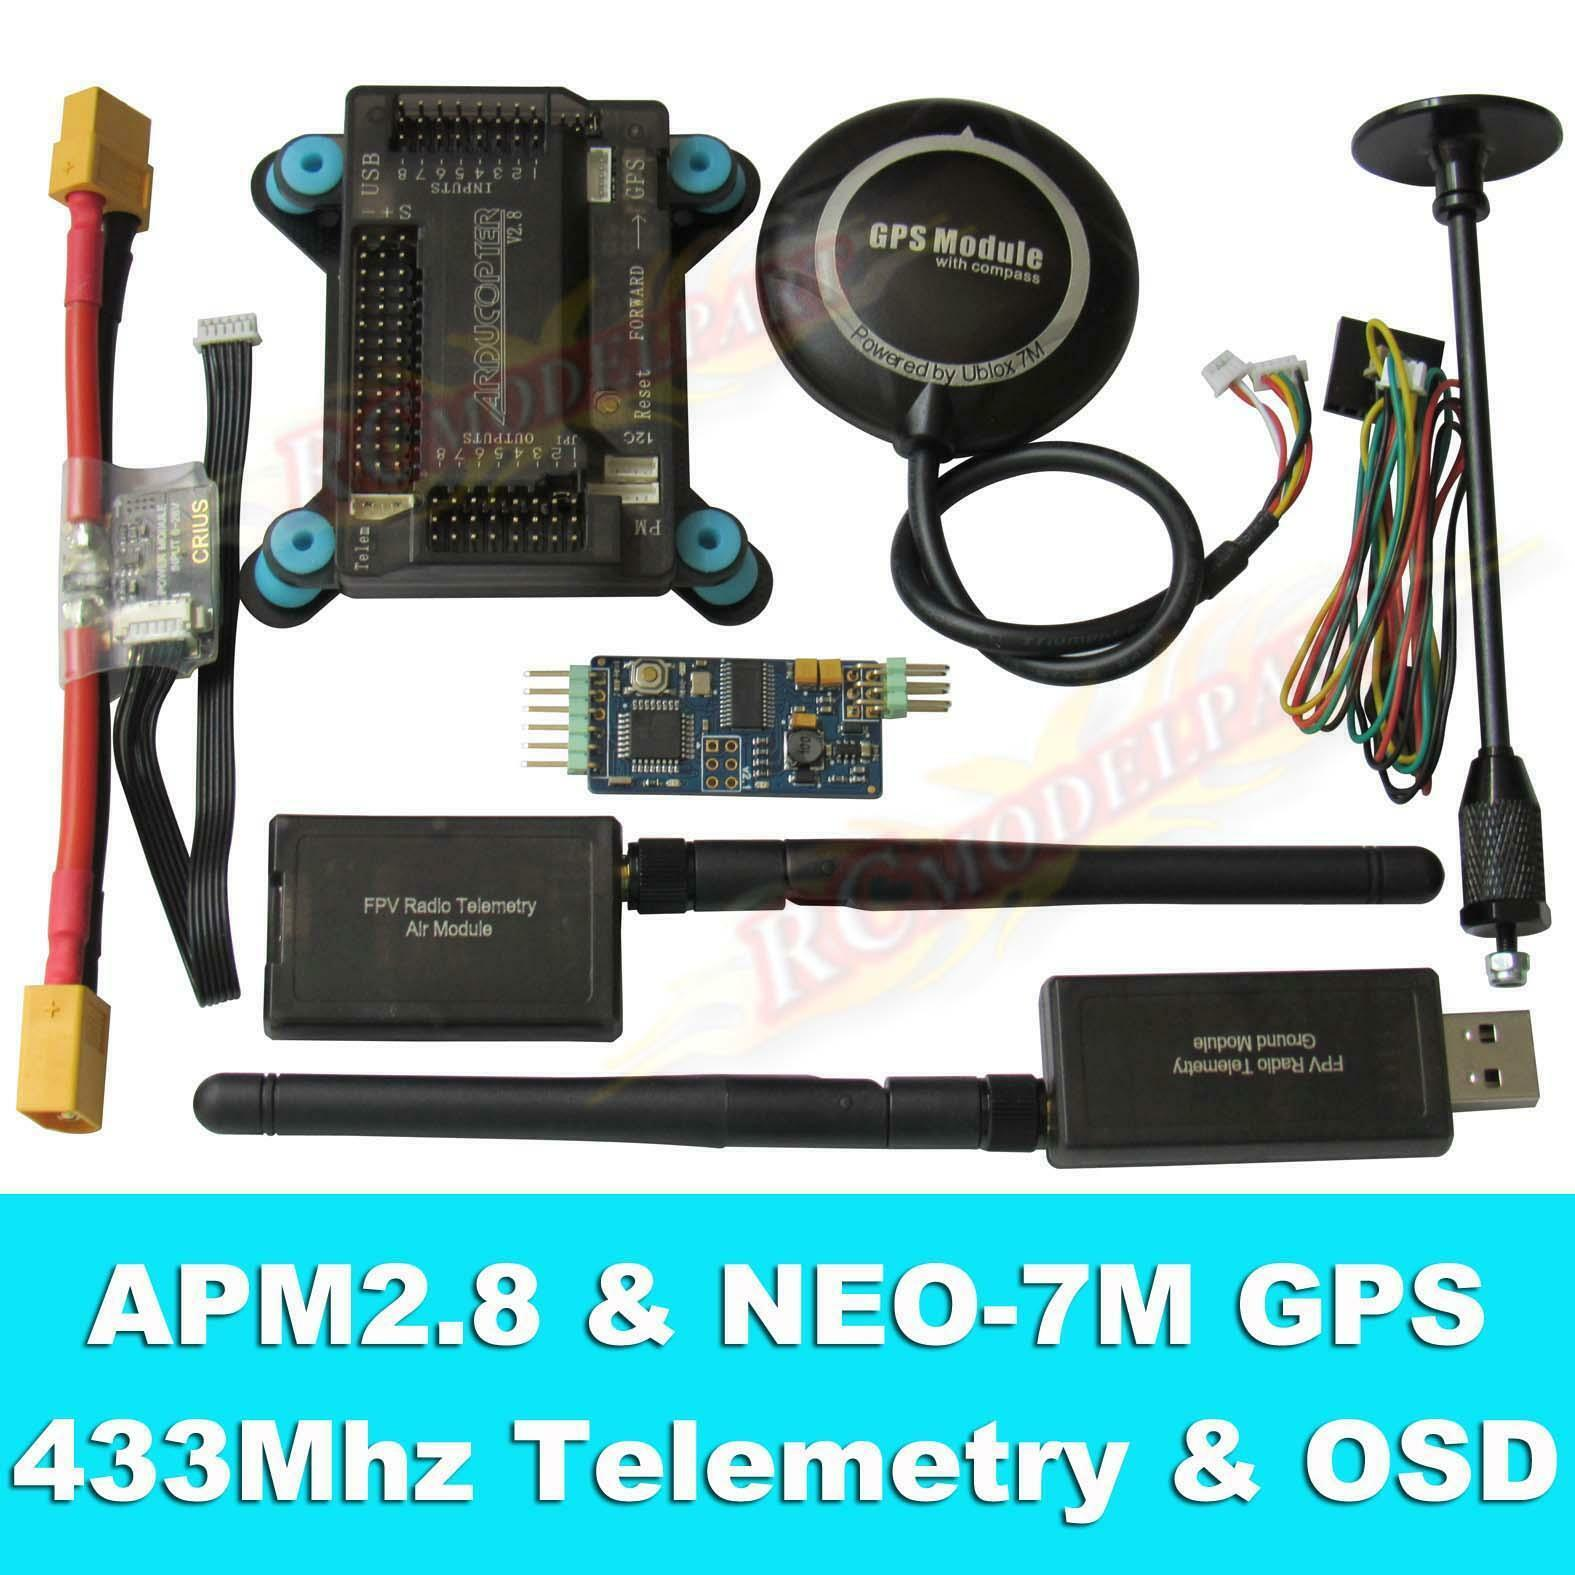 Apm2.8 Flight Controller + neo-7m GPS, 3dr 433mhz telemetry, OSD, Power módulos